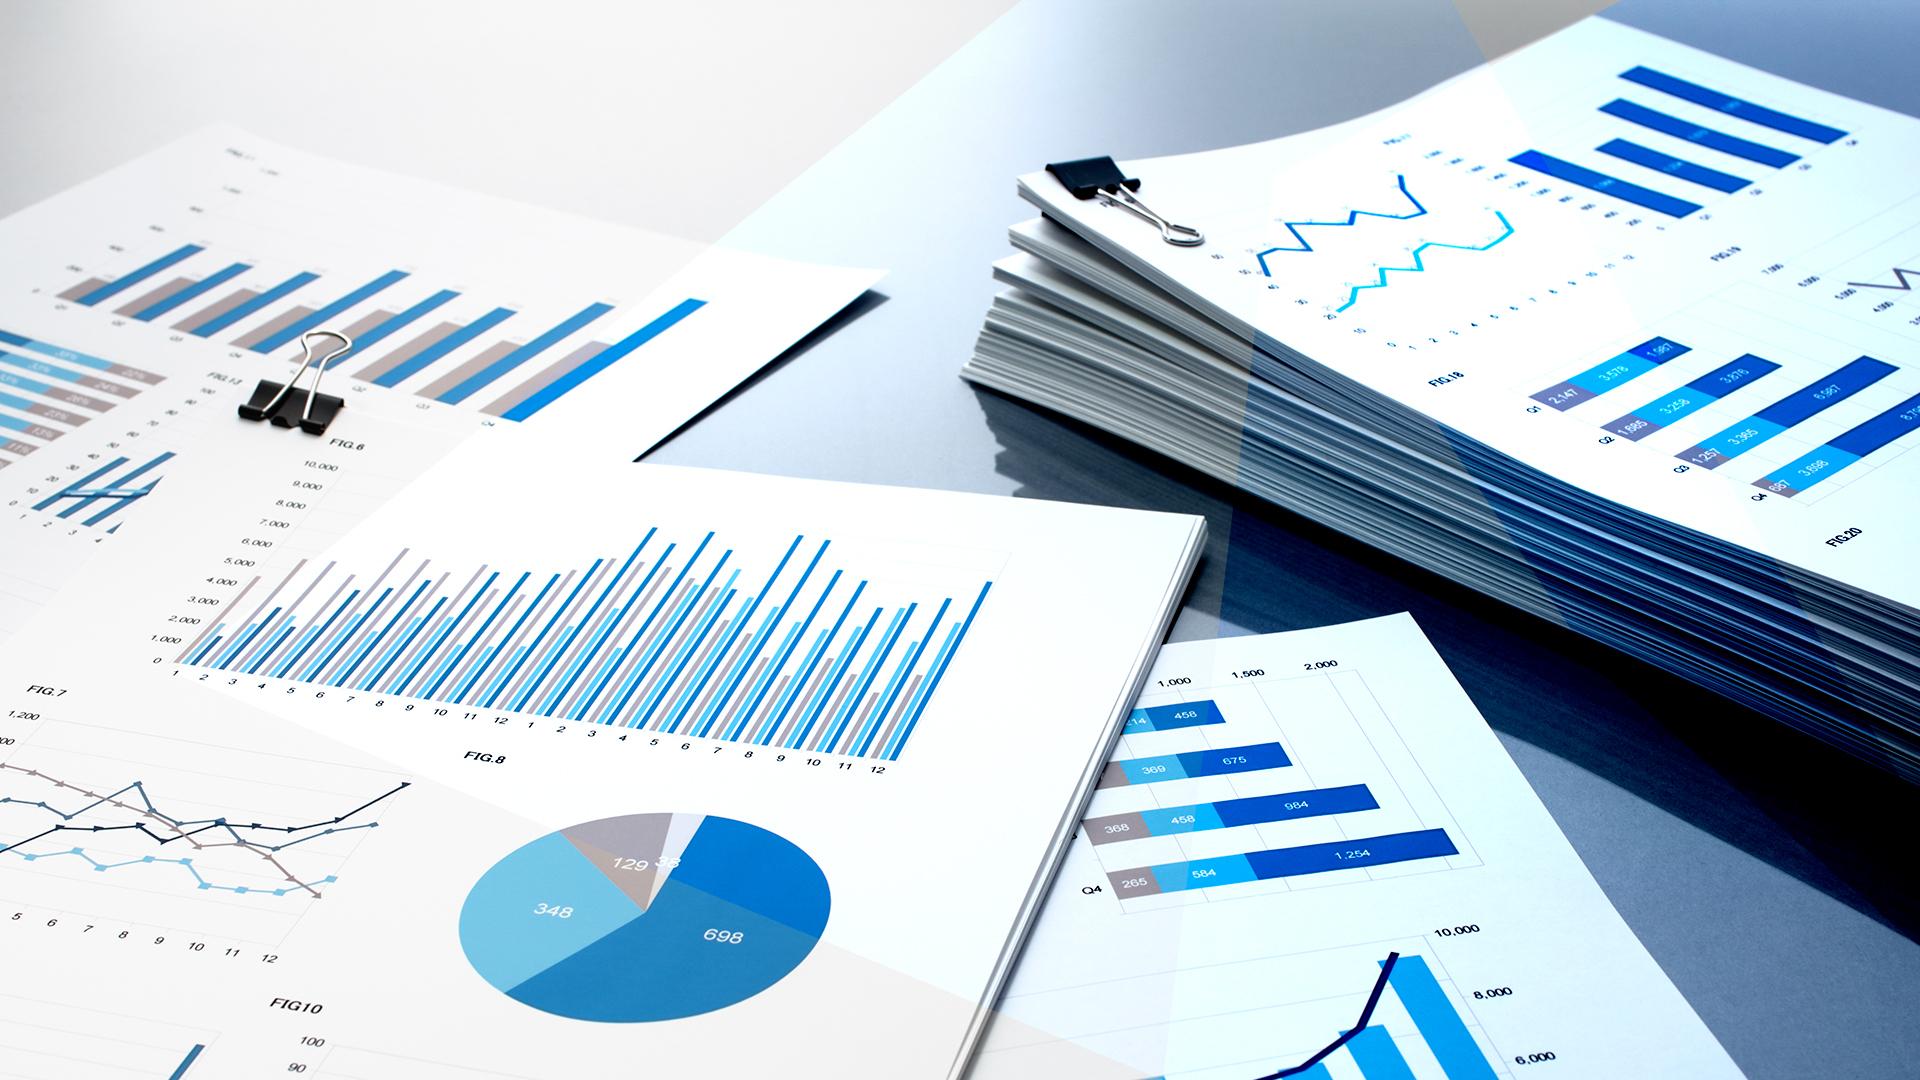 Wirtschaft, Geschäft, Statistik, Business, Vertrag, Geschäftskunden, Finanzen, Geschäftsbericht, Business Network, Finanzwesen, Papier, Diagramm, Ökonomie, Verträge, Auswertung, Diagramme, Balkendiagramm, Papierstapel